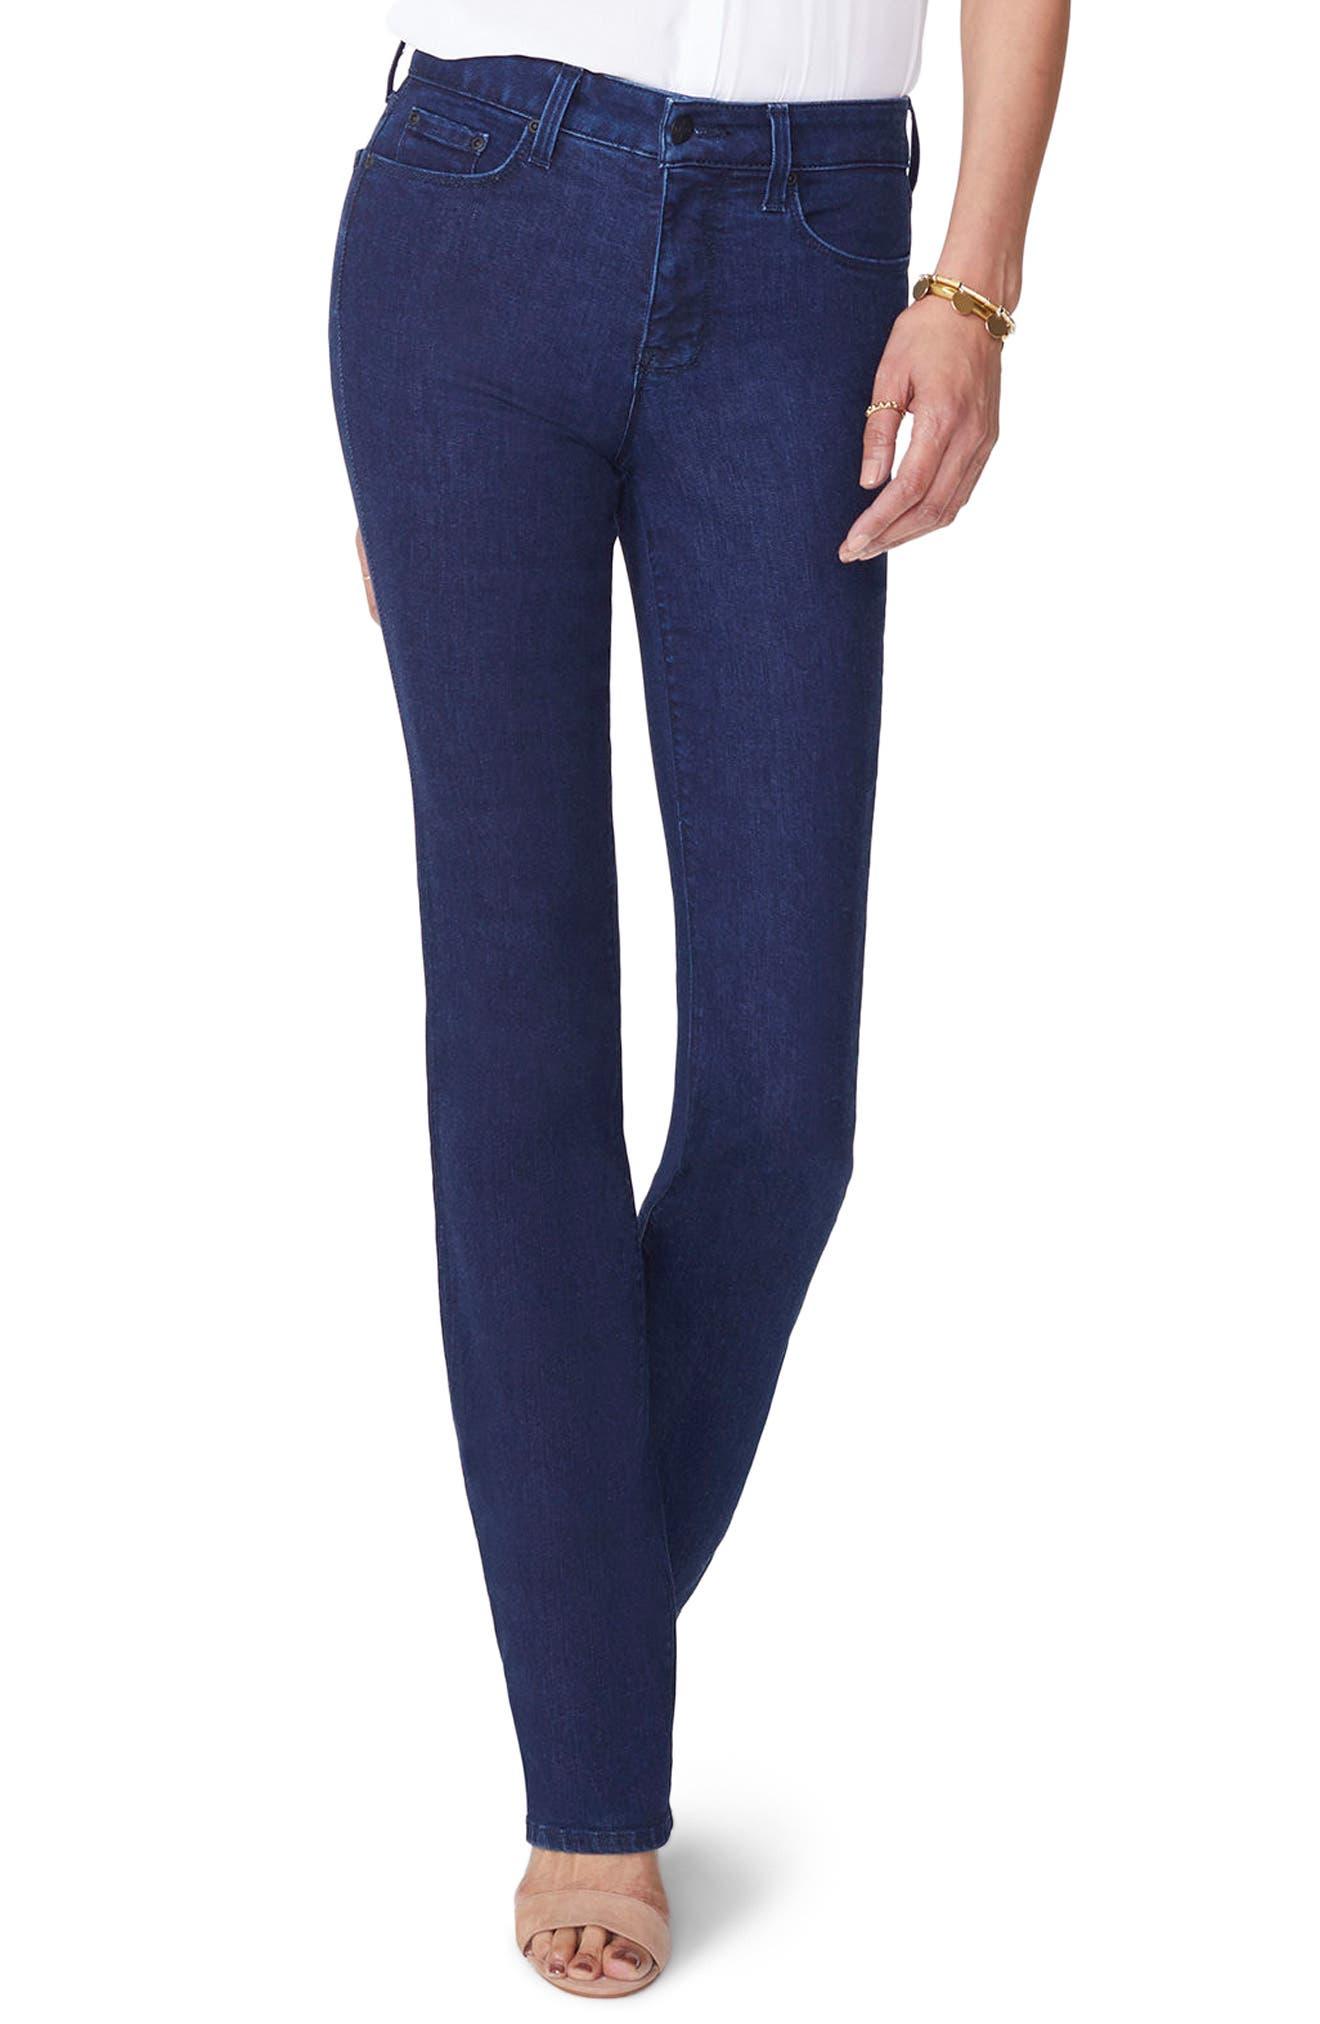 Women's NYDJ Marilyn High Waist Stretch Straight Leg Jeans